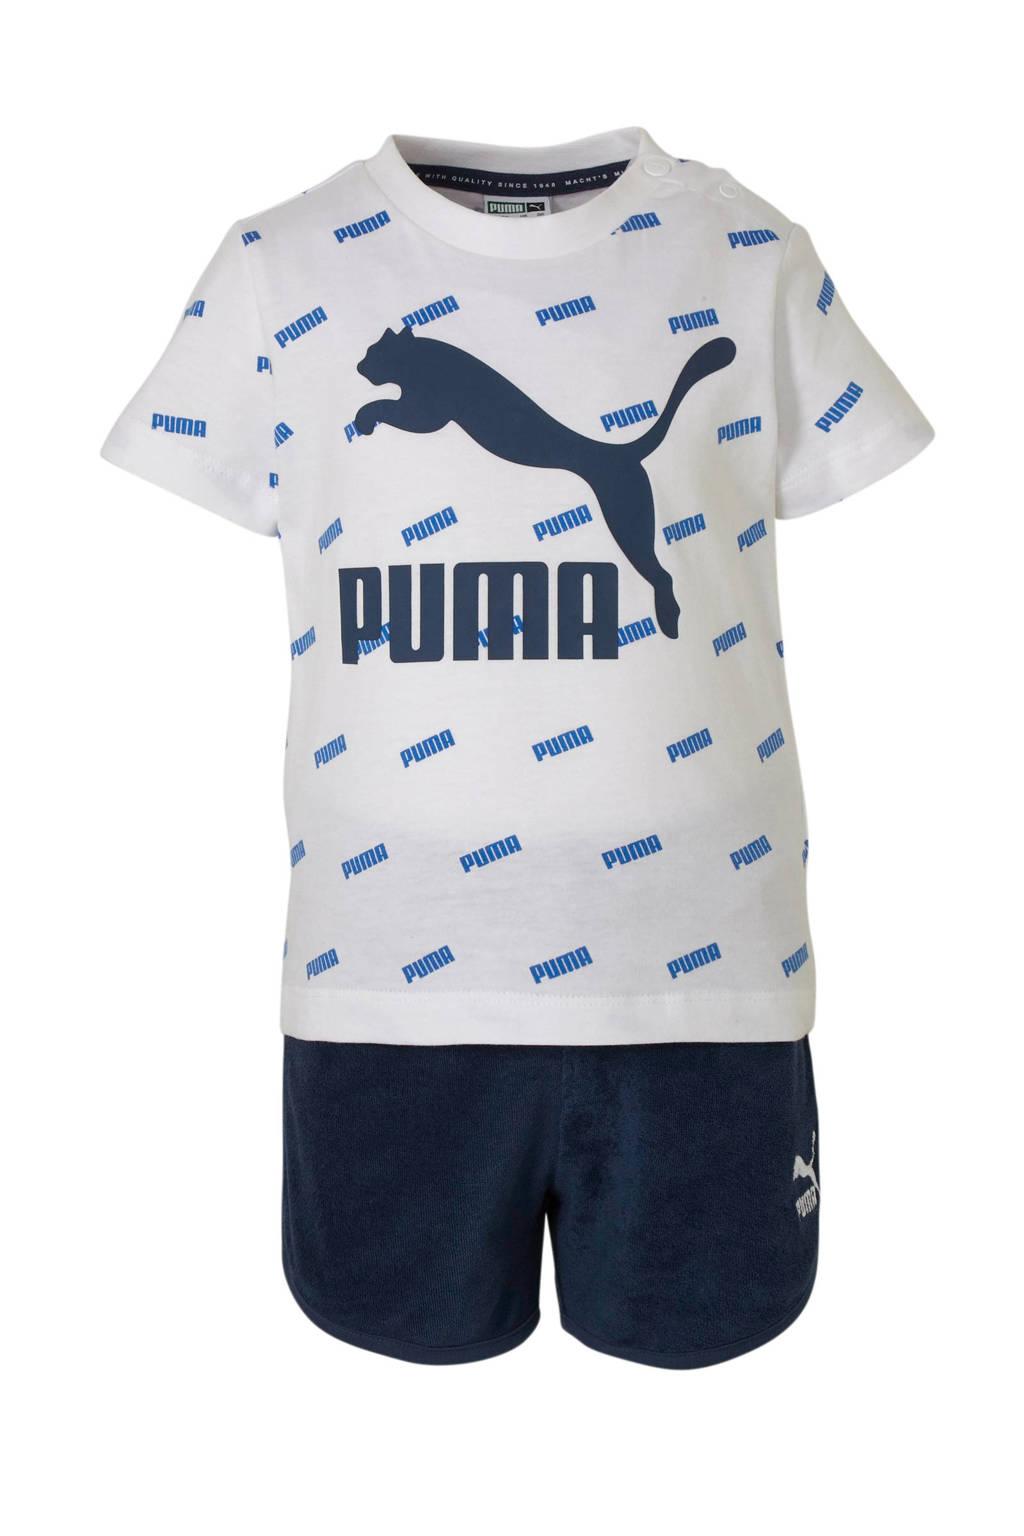 Puma   T-shirt + short wit/blauw, Wit/blauw